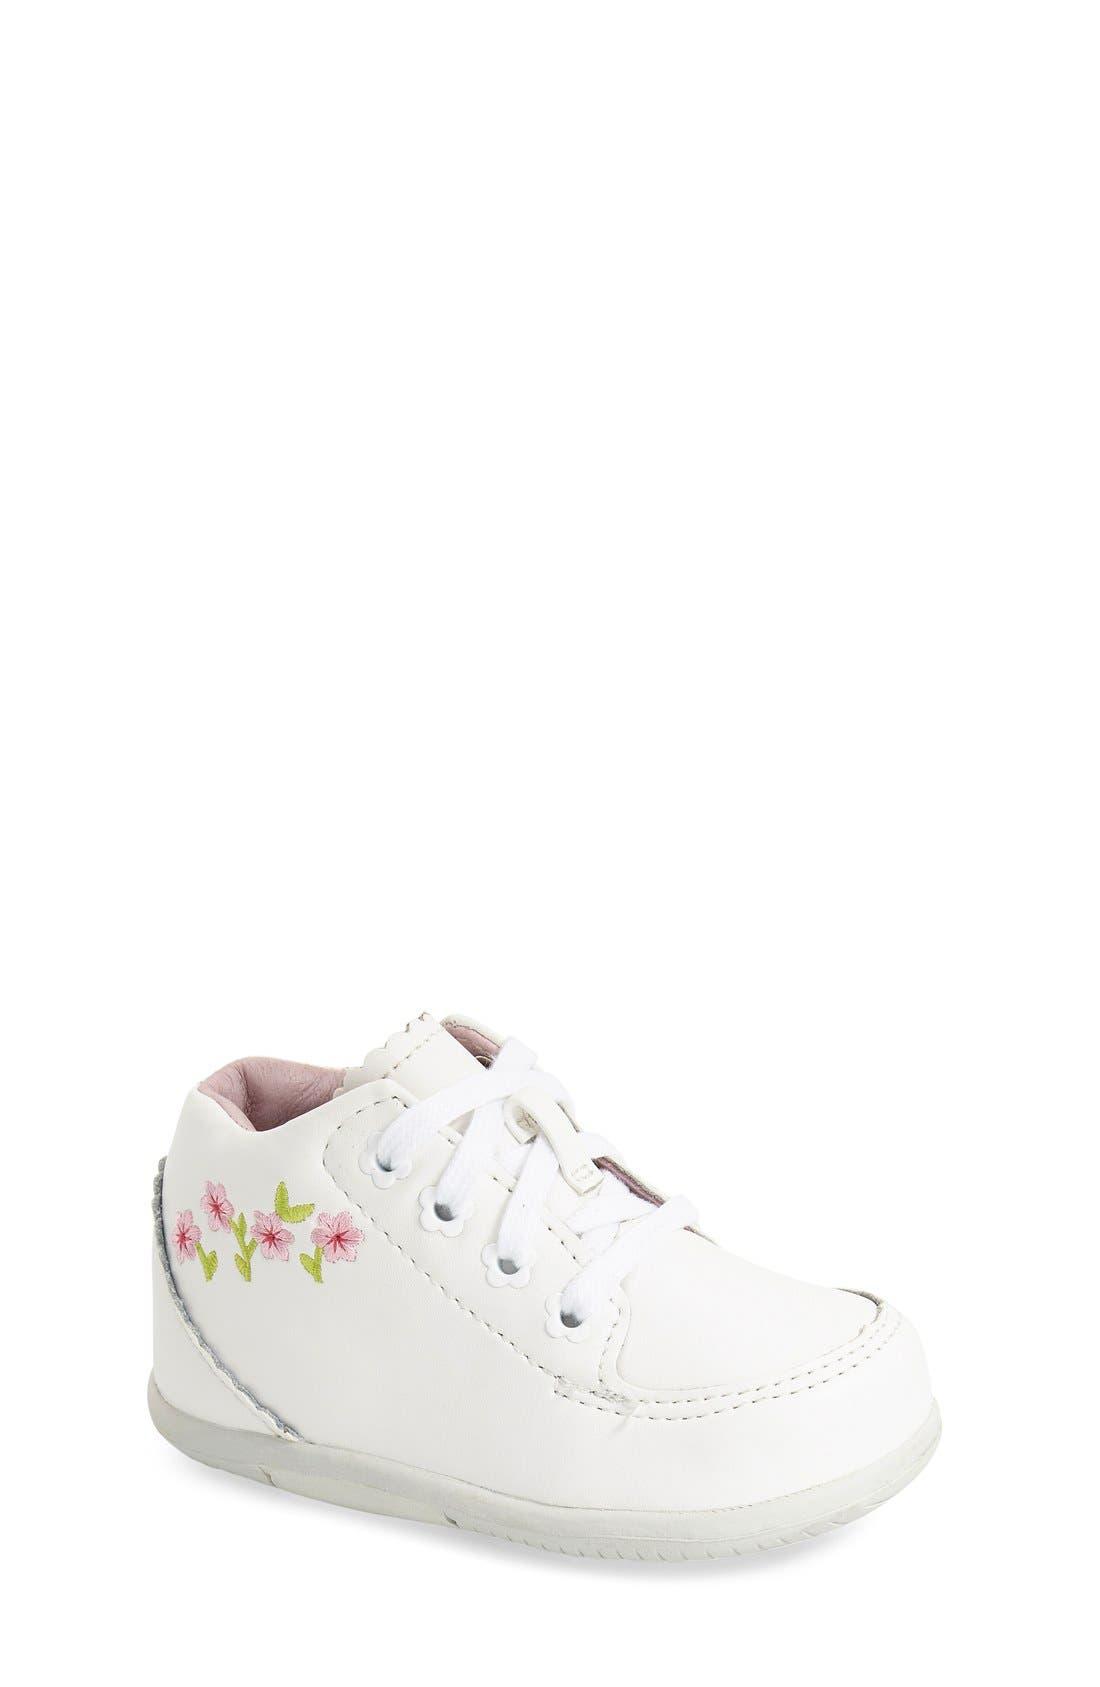 STRIDE RITE, 'Emilia' Leather Boot, Main thumbnail 1, color, WHITE